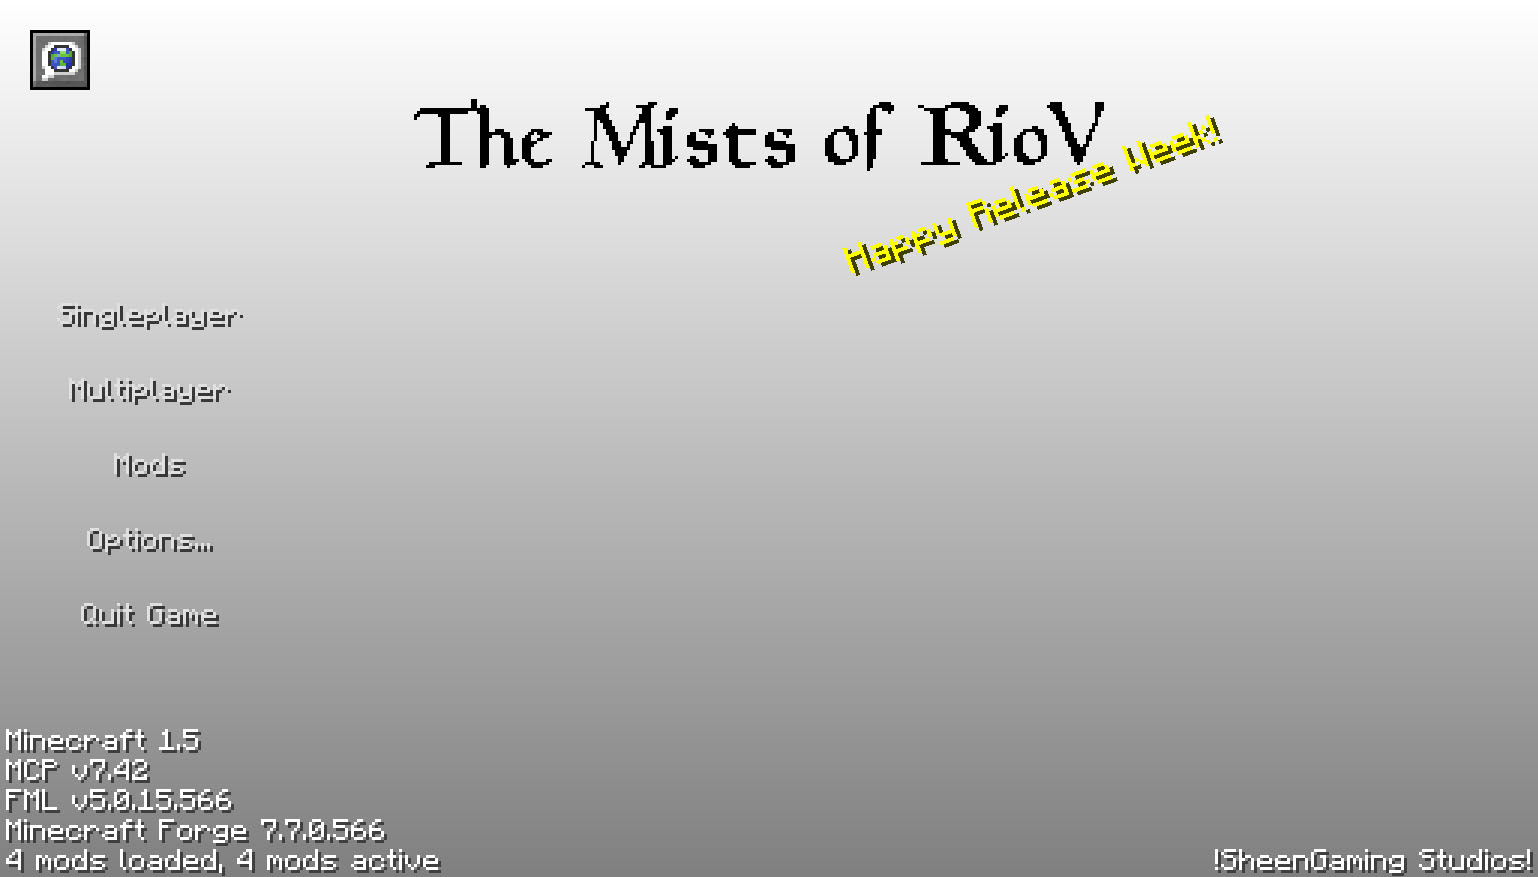 https://i0.wp.com/cdn.9pety.com/imgs/Mods/The-Mists-of-RioV-Mod-5.jpg?ssl=1